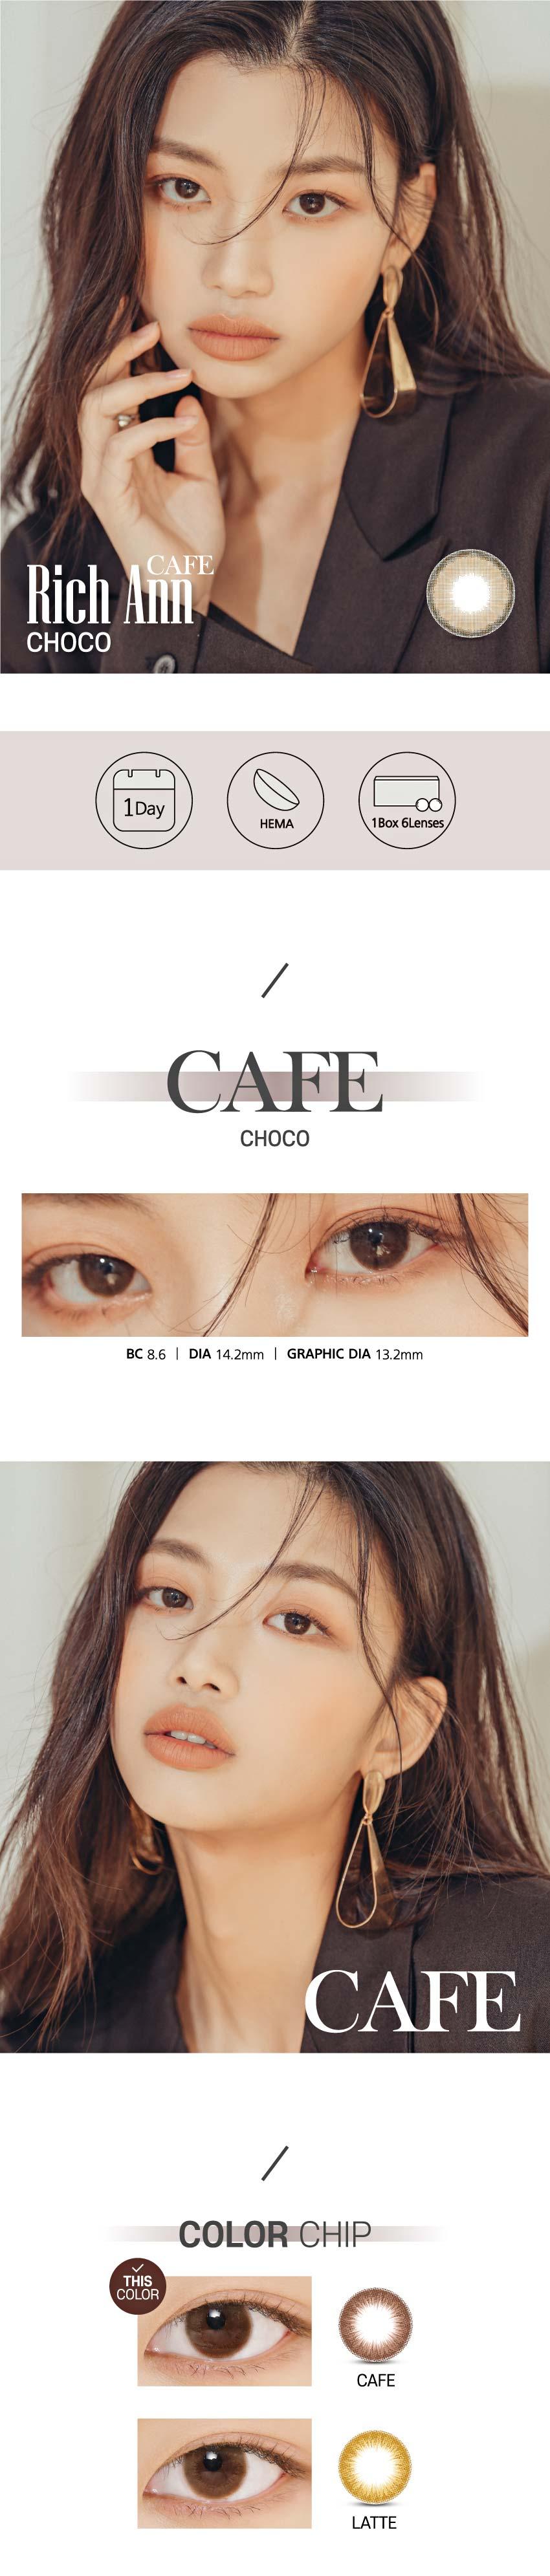 rich-ann-cafe-korean-colored-lenses.jpg